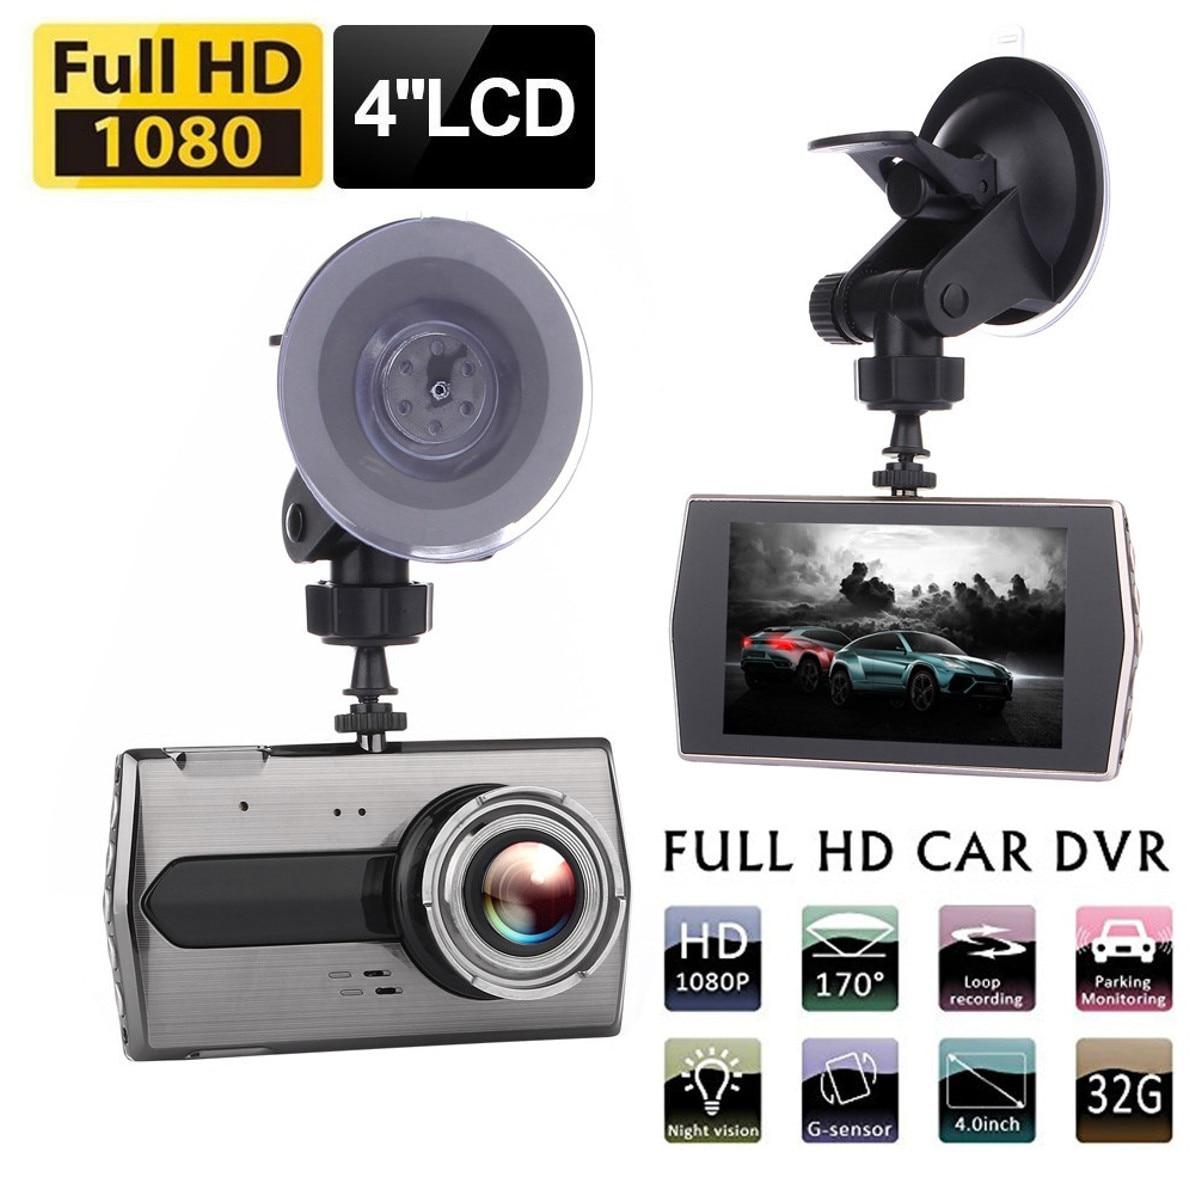 4 inch Dual Lens Camera HD 1080P Car Vehicle blackbox DVR Video Dash Cam Front Rear Recorder H506 IPS